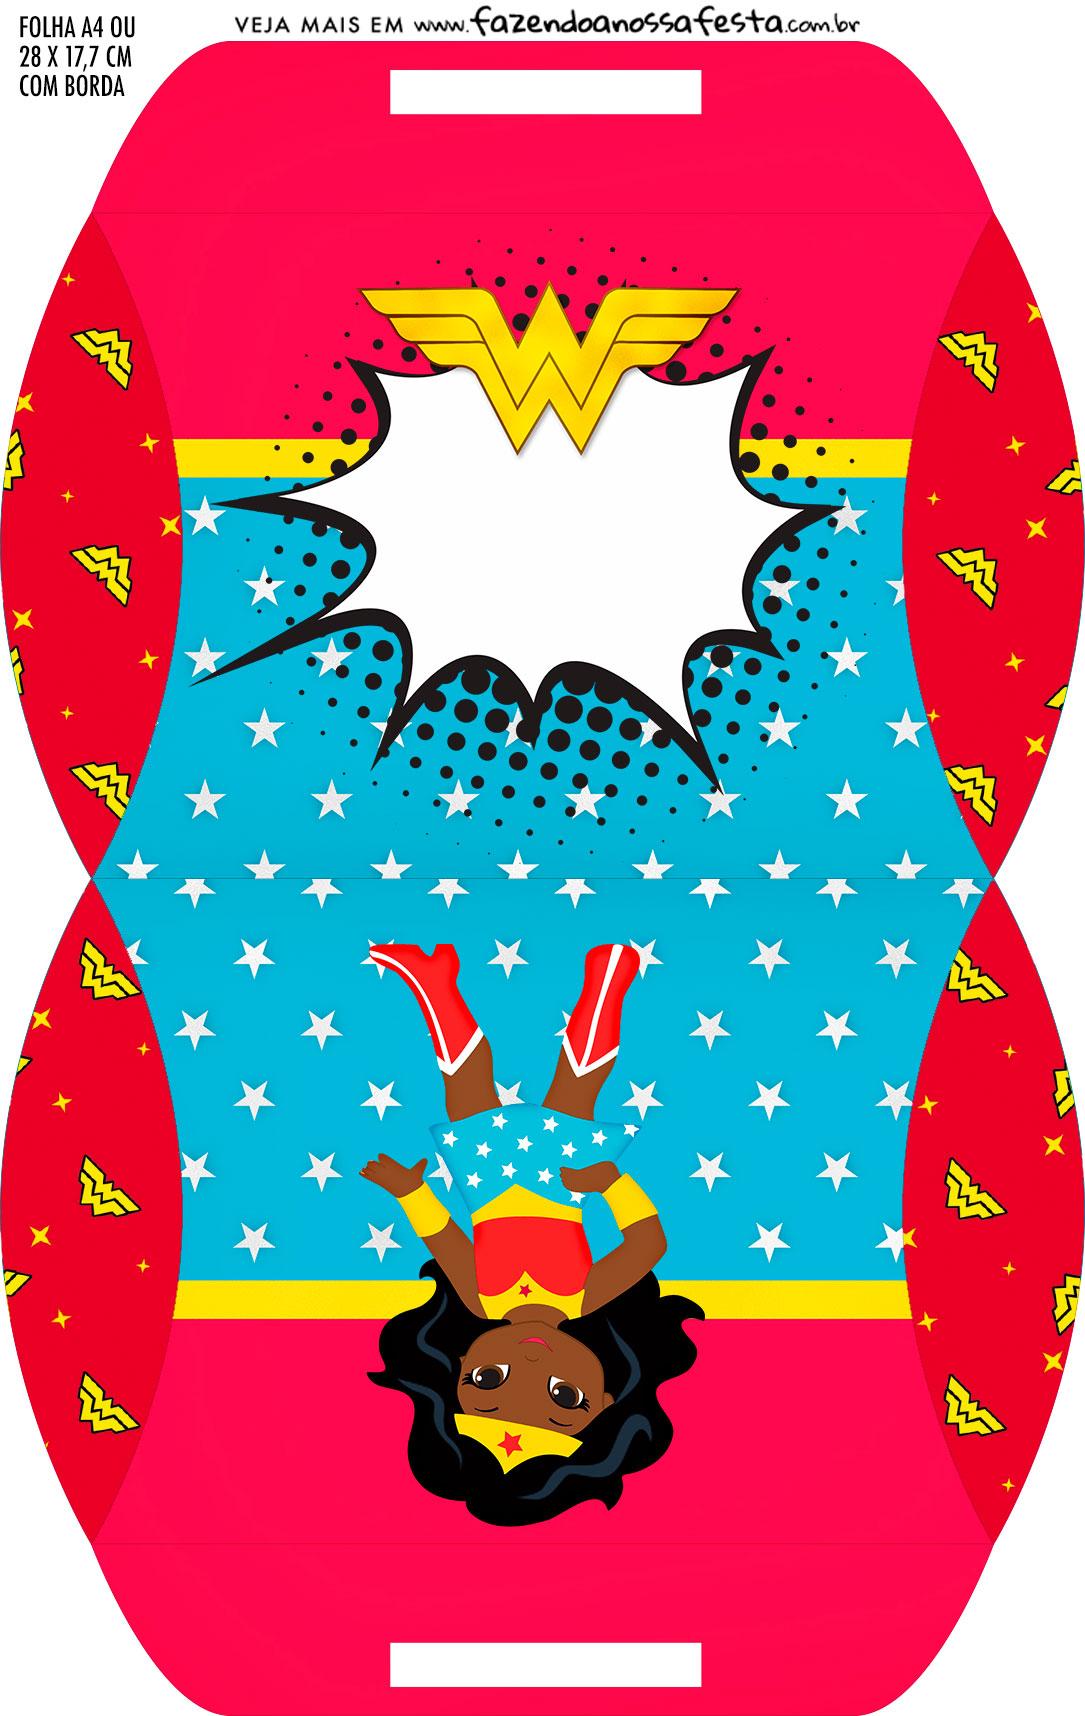 Caixa Almofada bolsinha Festa Mulher Maravilha Afro Cute